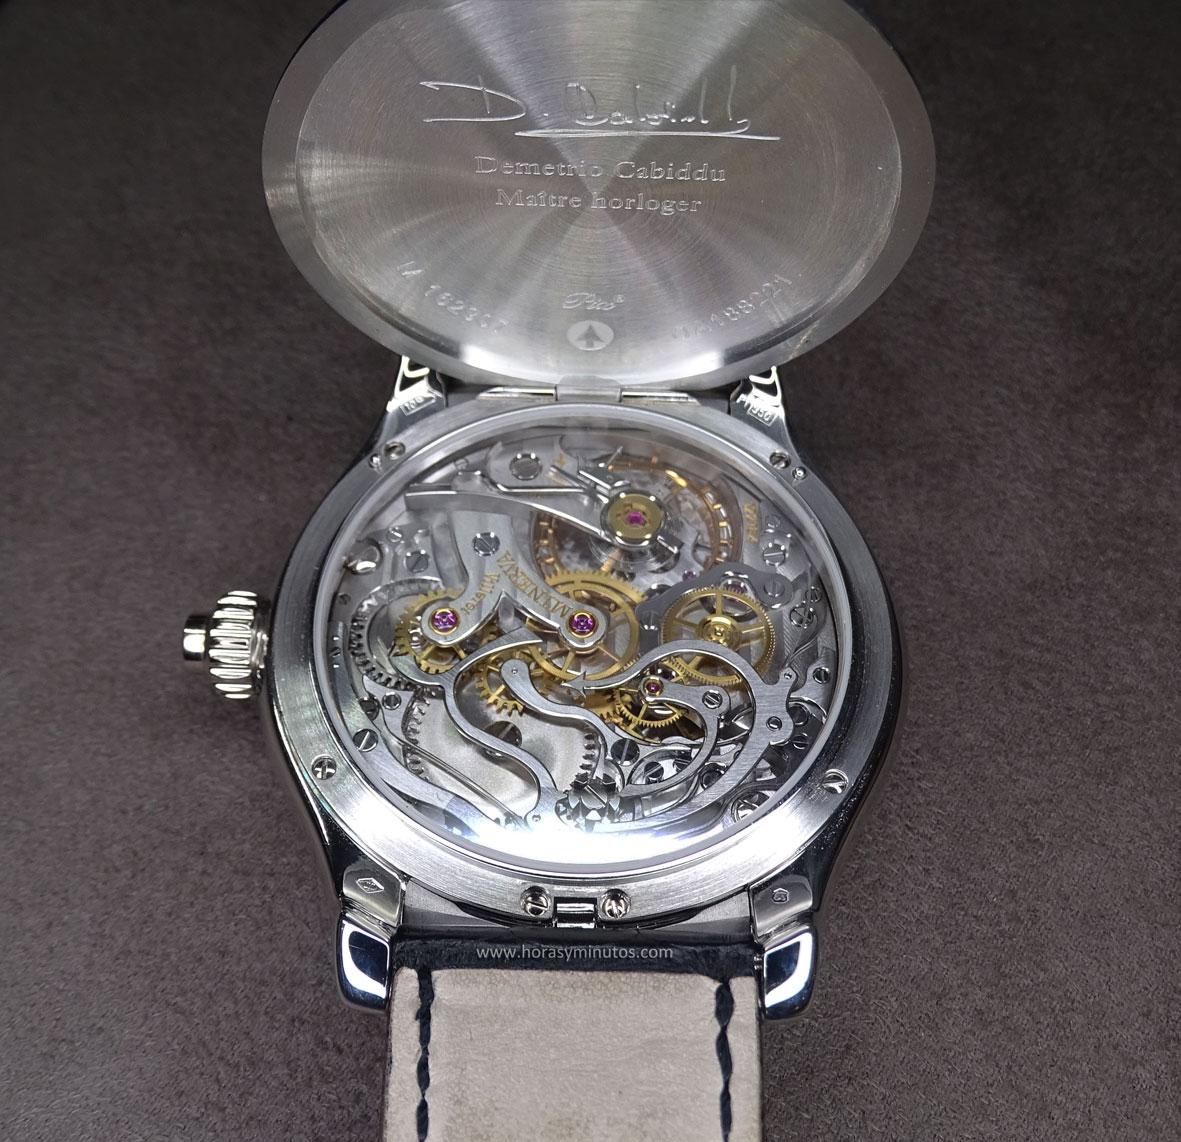 Montblanc Villeret 1858 Grand Chronographe Email Grand Feu reverso Salon QP